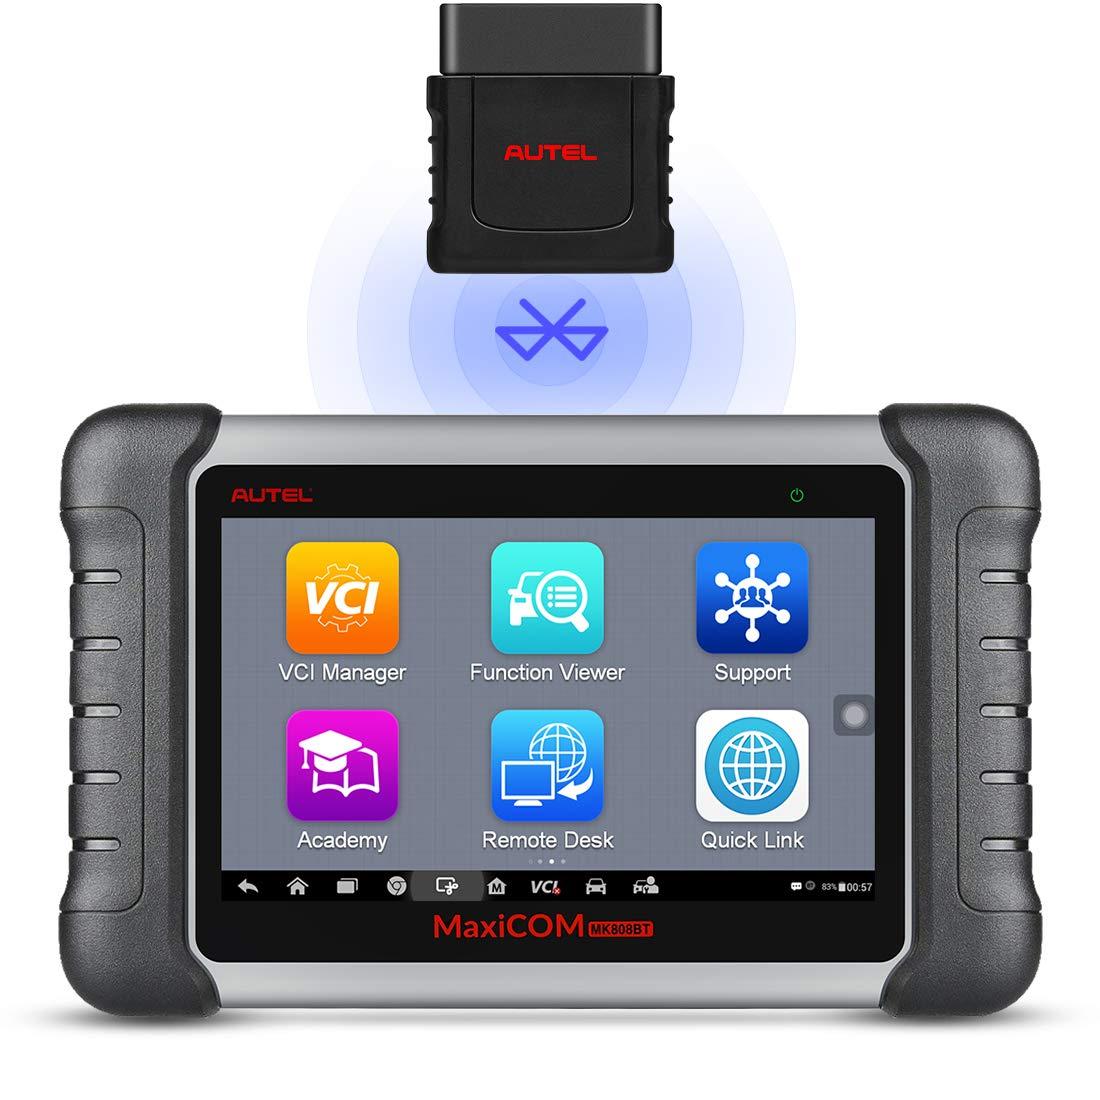 Autel MaxiCOM MK808BT OBD2 Scanner Wireless Bluetooth&Full System Diagnostic Tool with Oil Reset/EPB/BMS/SAS/DPF/TPMS, Advanced Version of MK808